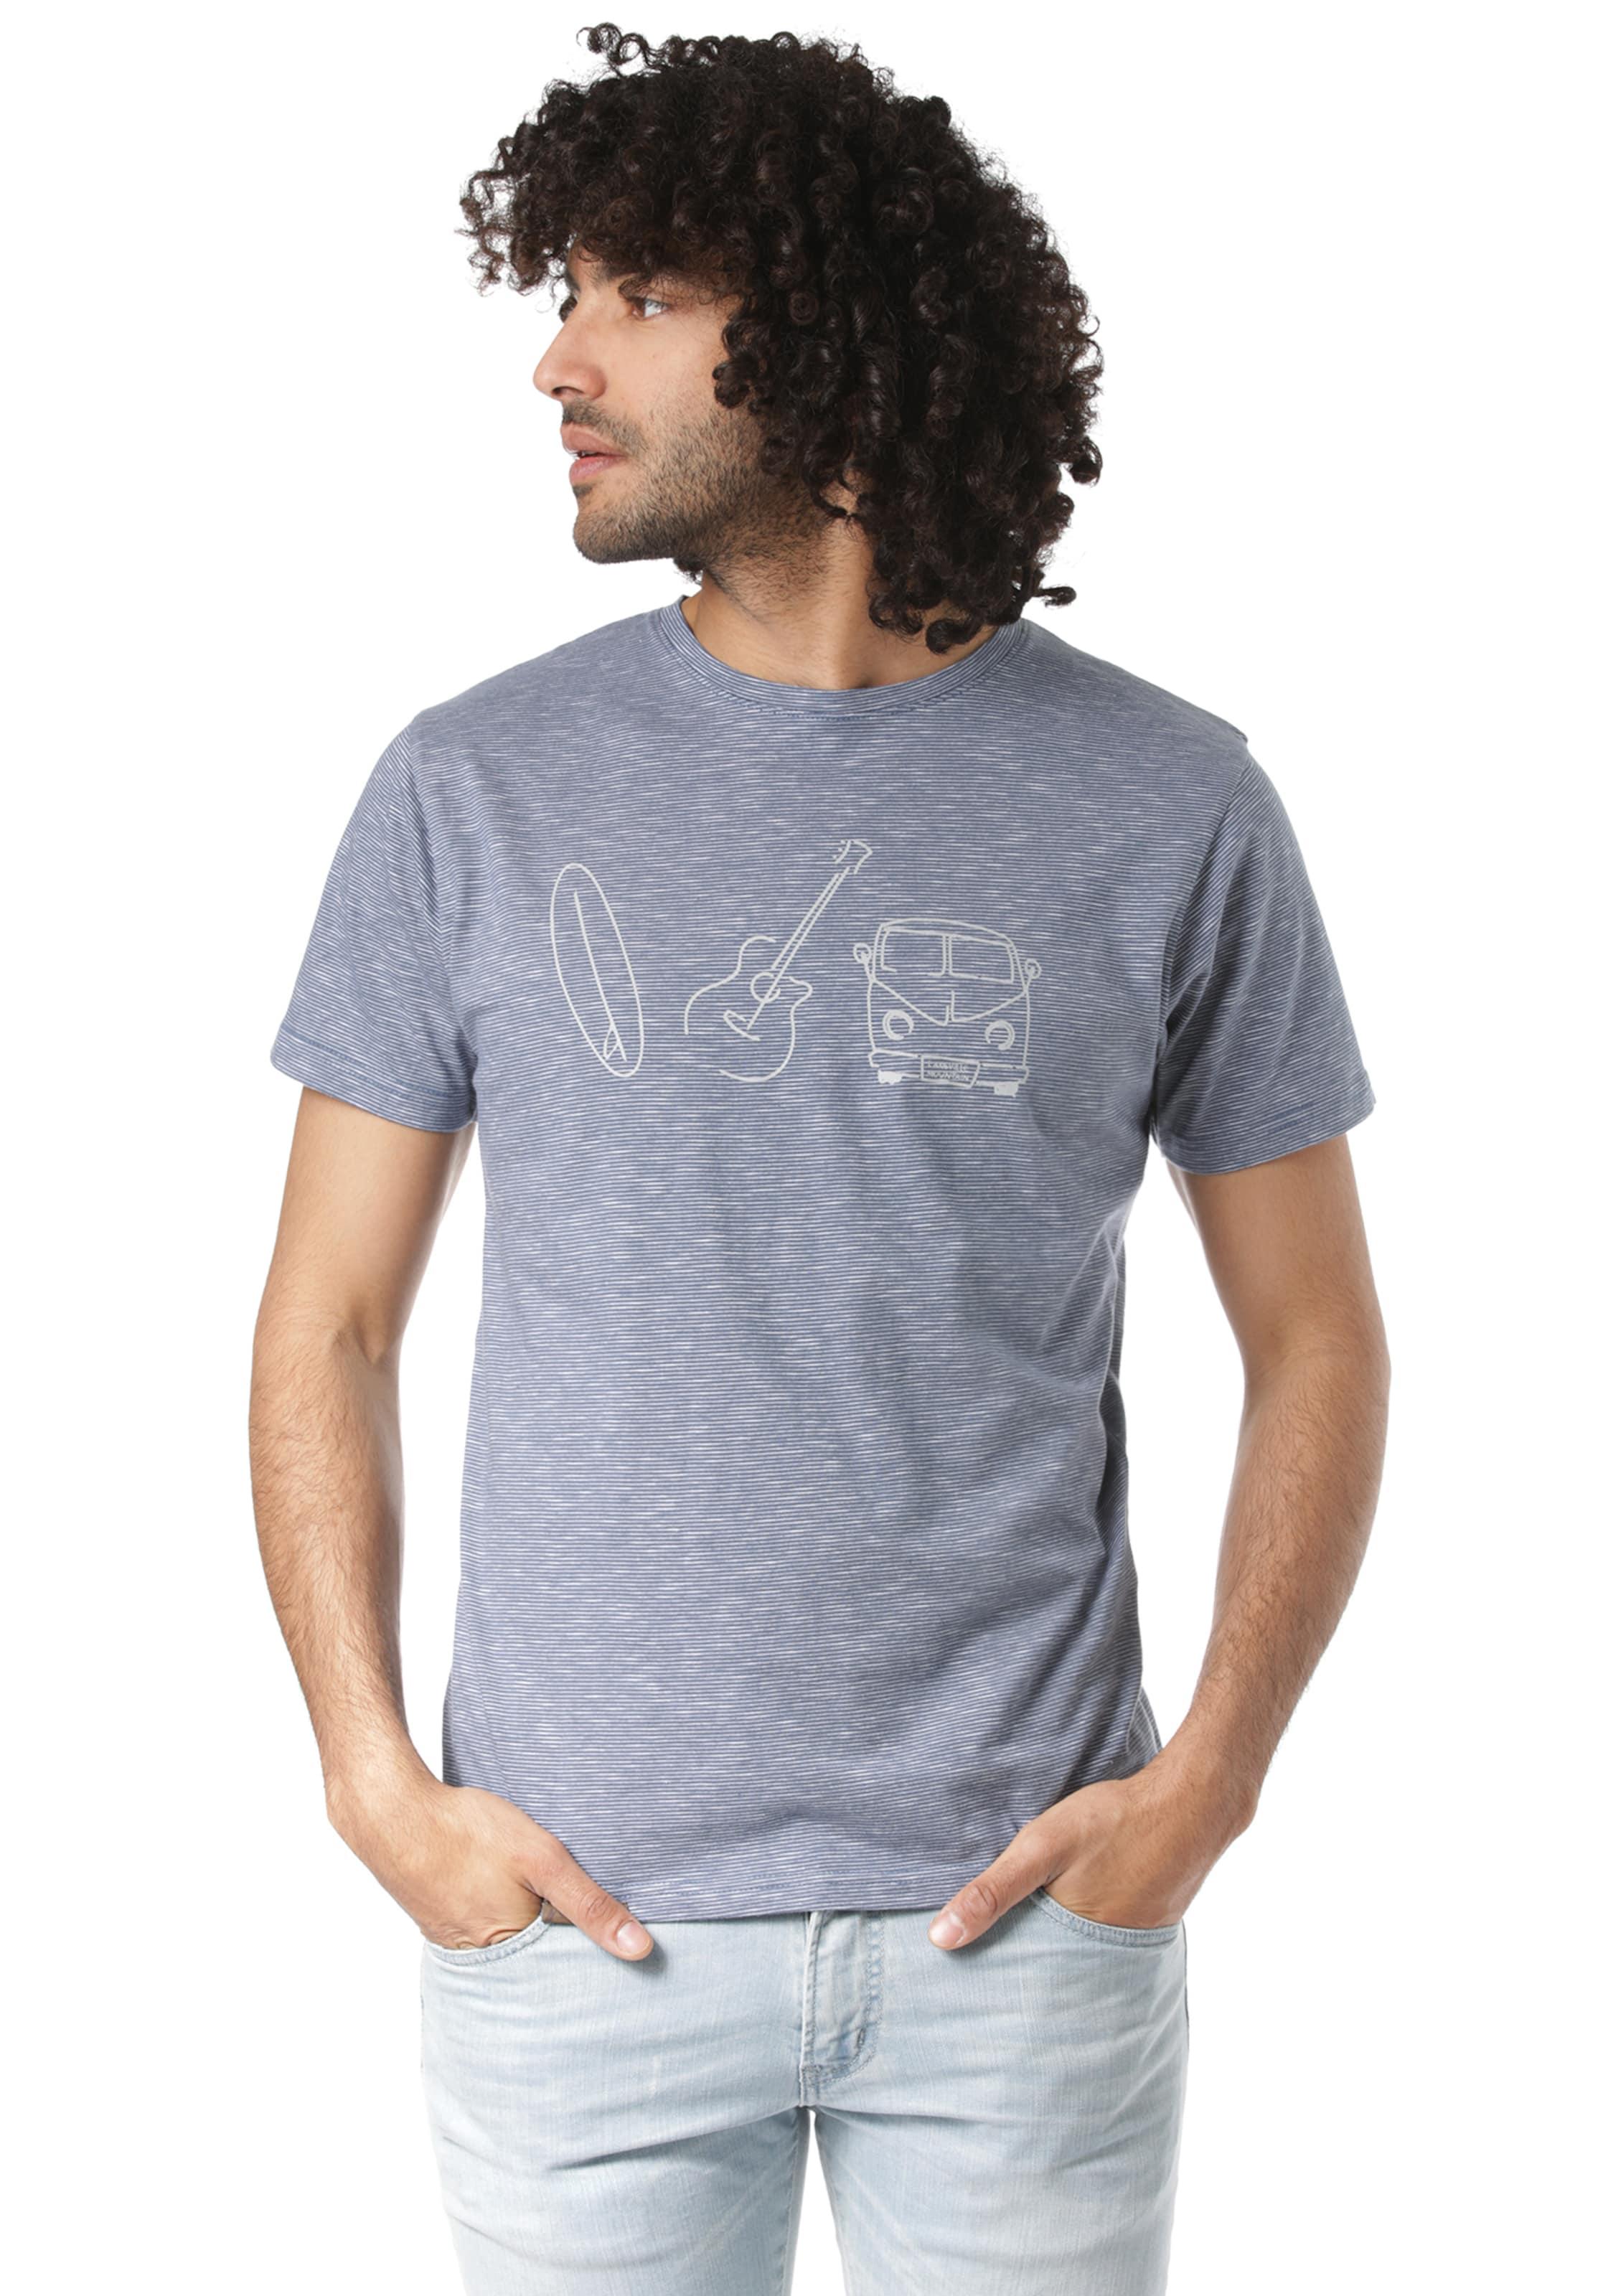 'mano' T Mountain Lakeville shirt In TaubenblauWeiß yvN8wOn0m